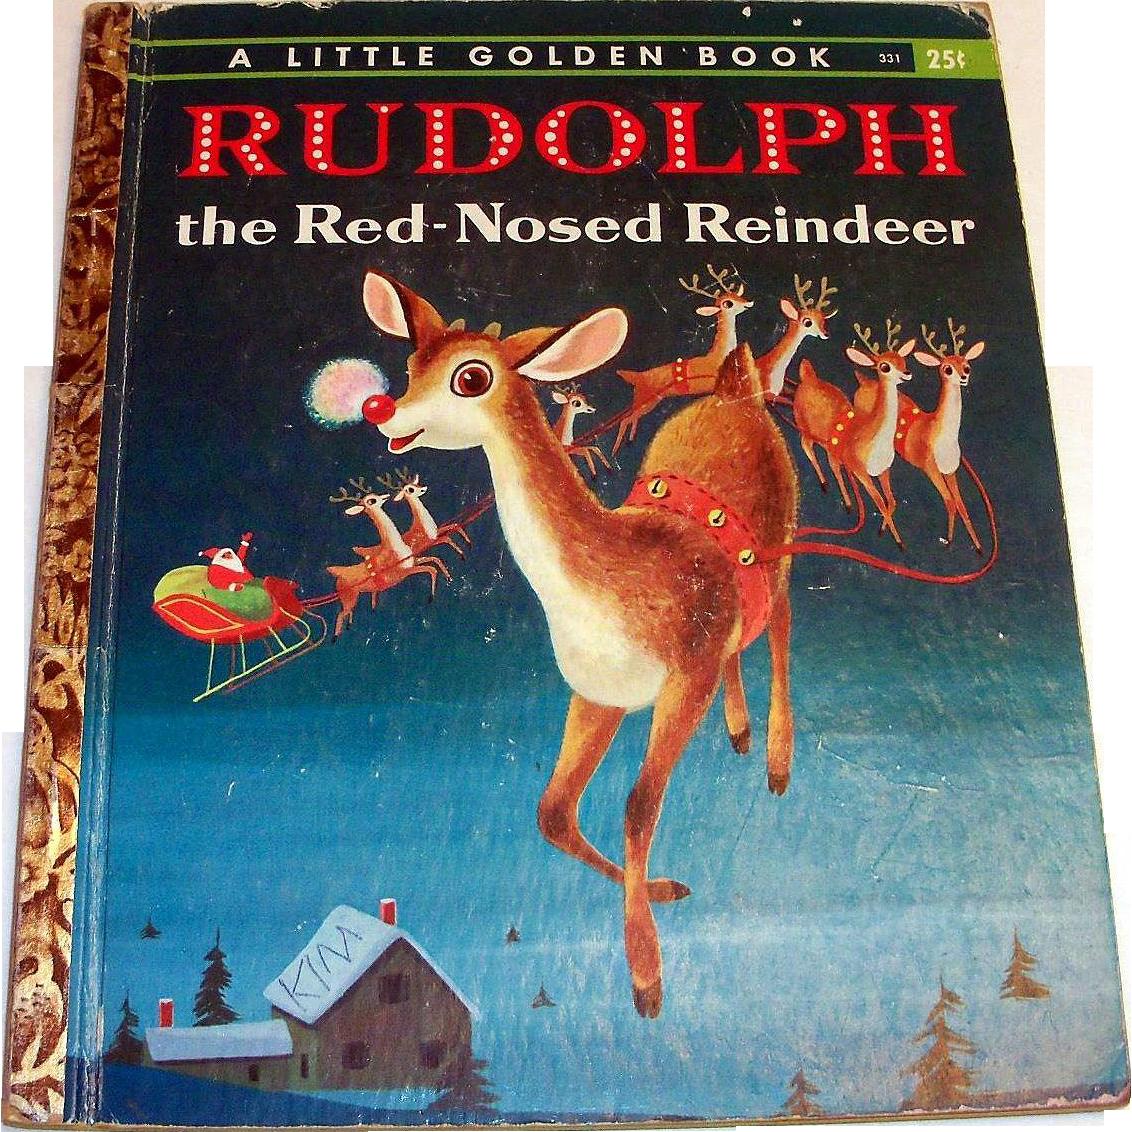 Little Golden: Rudolph The Red Nose Reindeer Children's Book - 1958